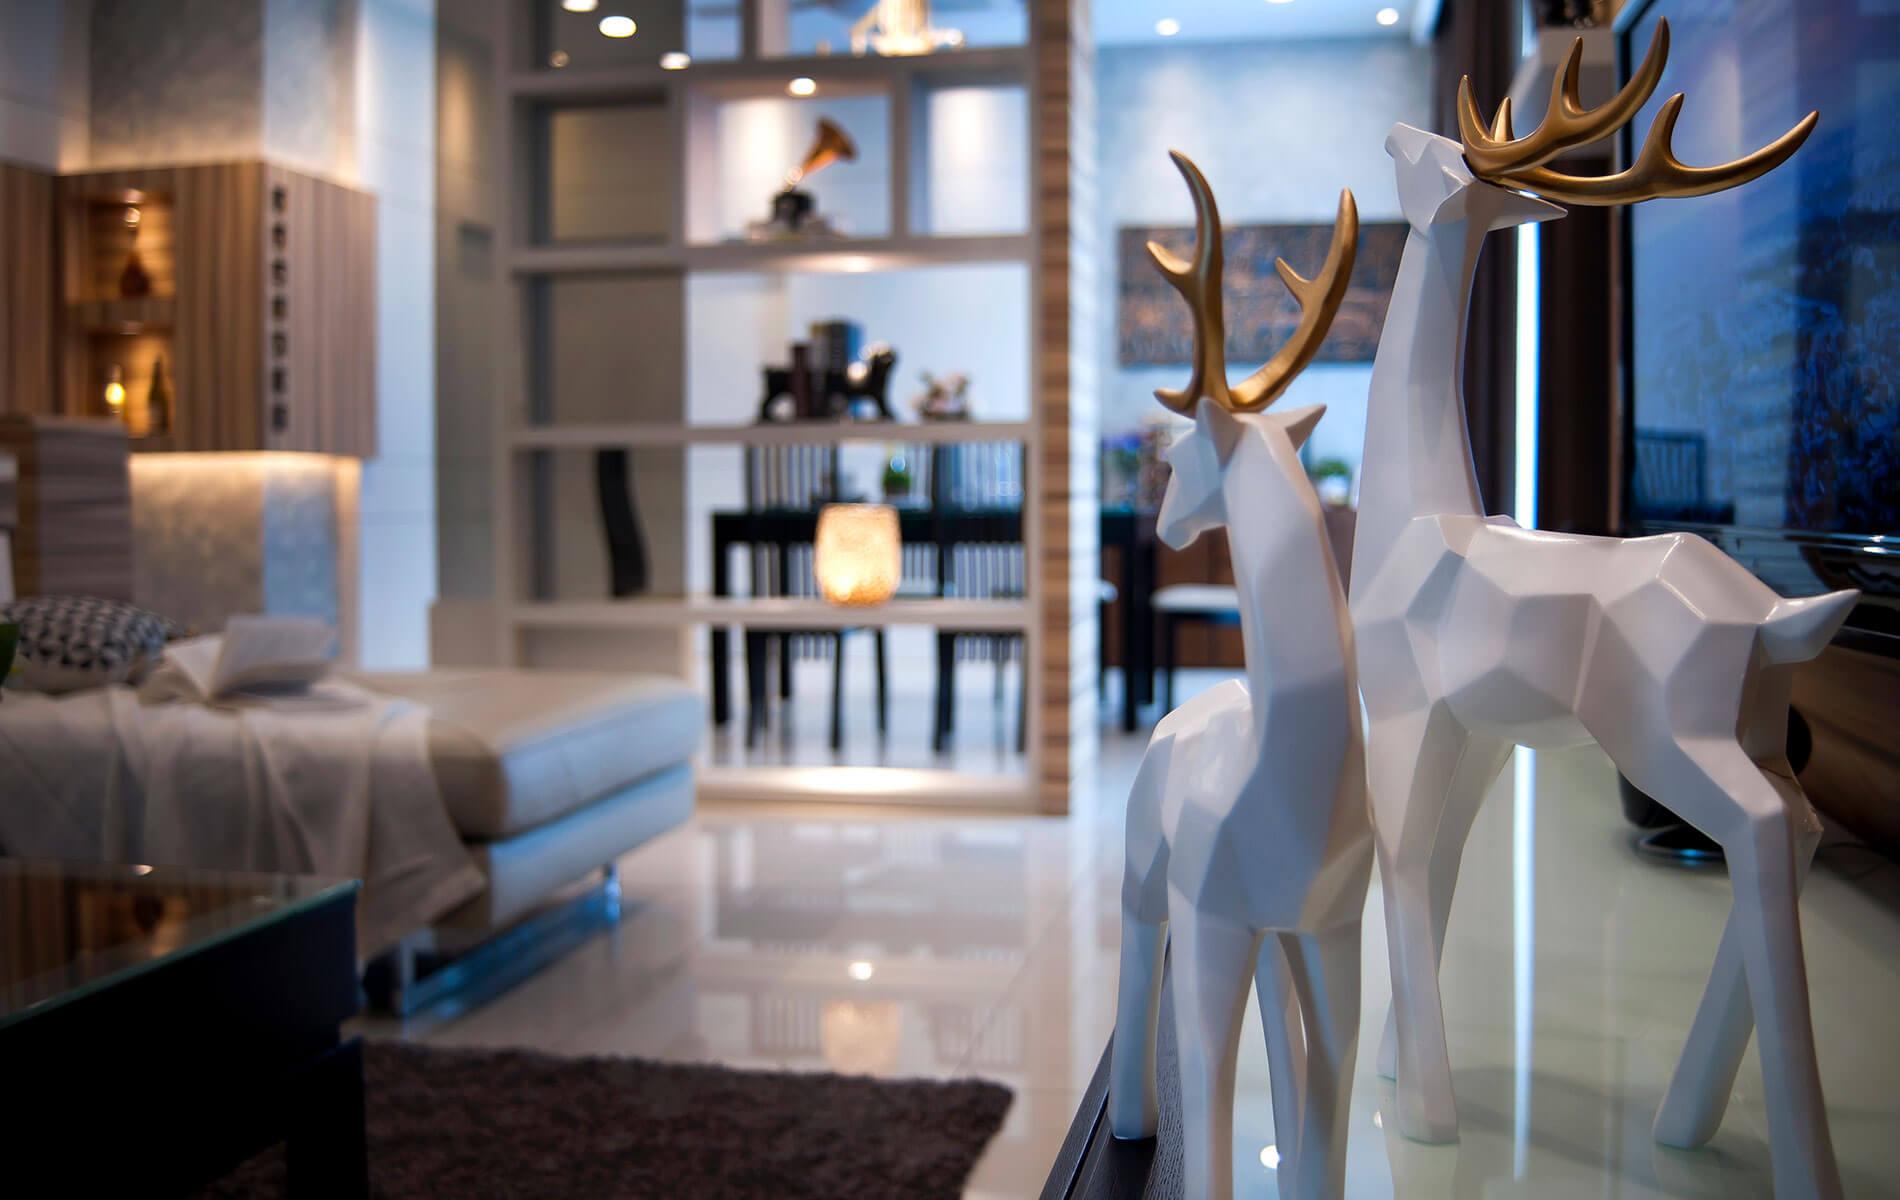 Interior Design Malaysia, Interior Designer Malaysia - Inspire Edge Studio